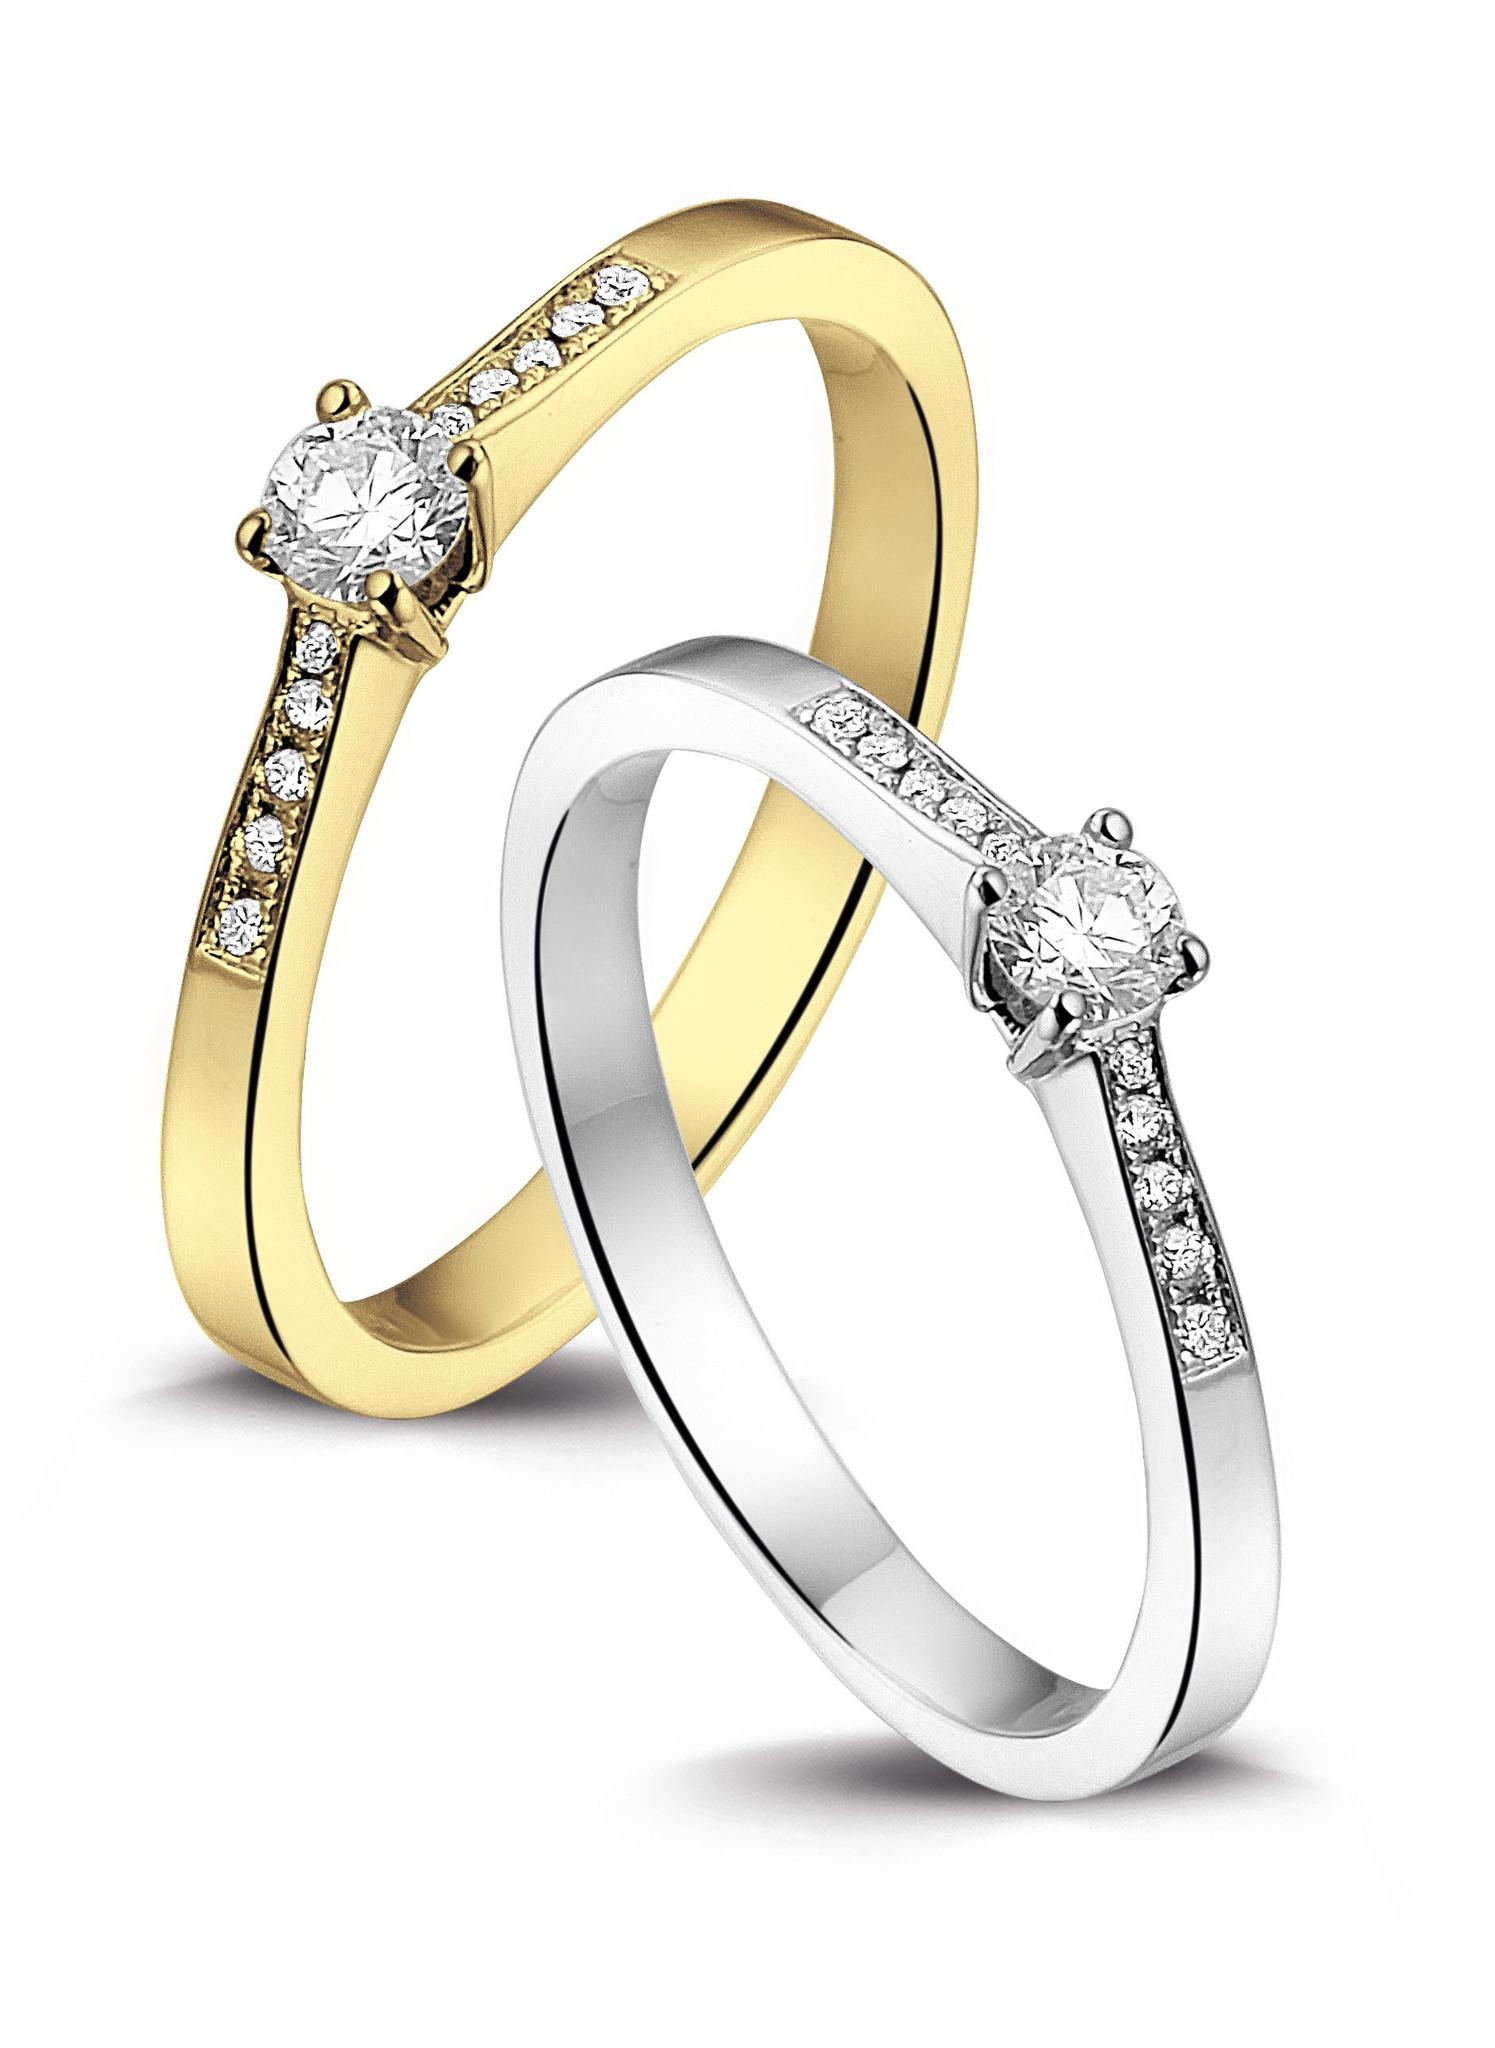 14 karaat witgouden ring met diamant 0.05 crt. - Solitair - Witgoud-2